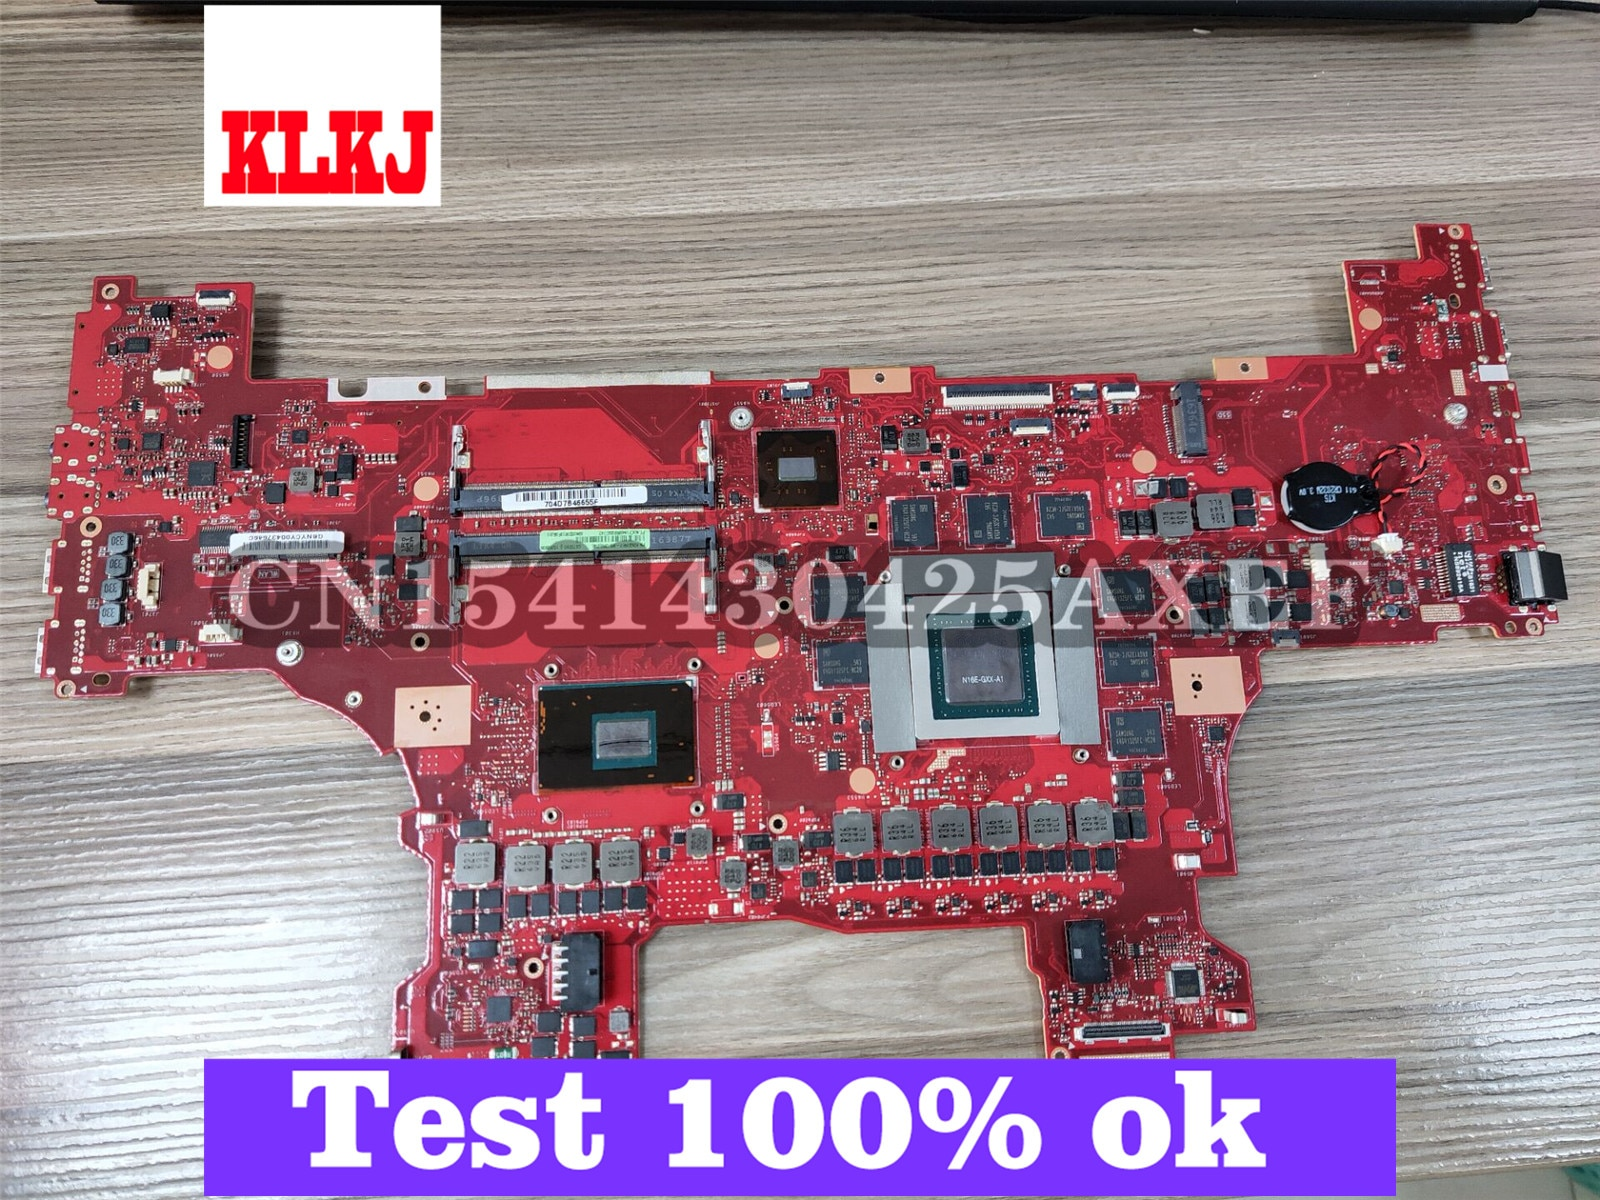 KLKJ GX700VO اللوحة الأم لأجهزة الكمبيوتر المحمول ASUS ROG GX700VO GX700V اللوحة الرئيسية الأصلية I7-6820HK GTX980M-8GB